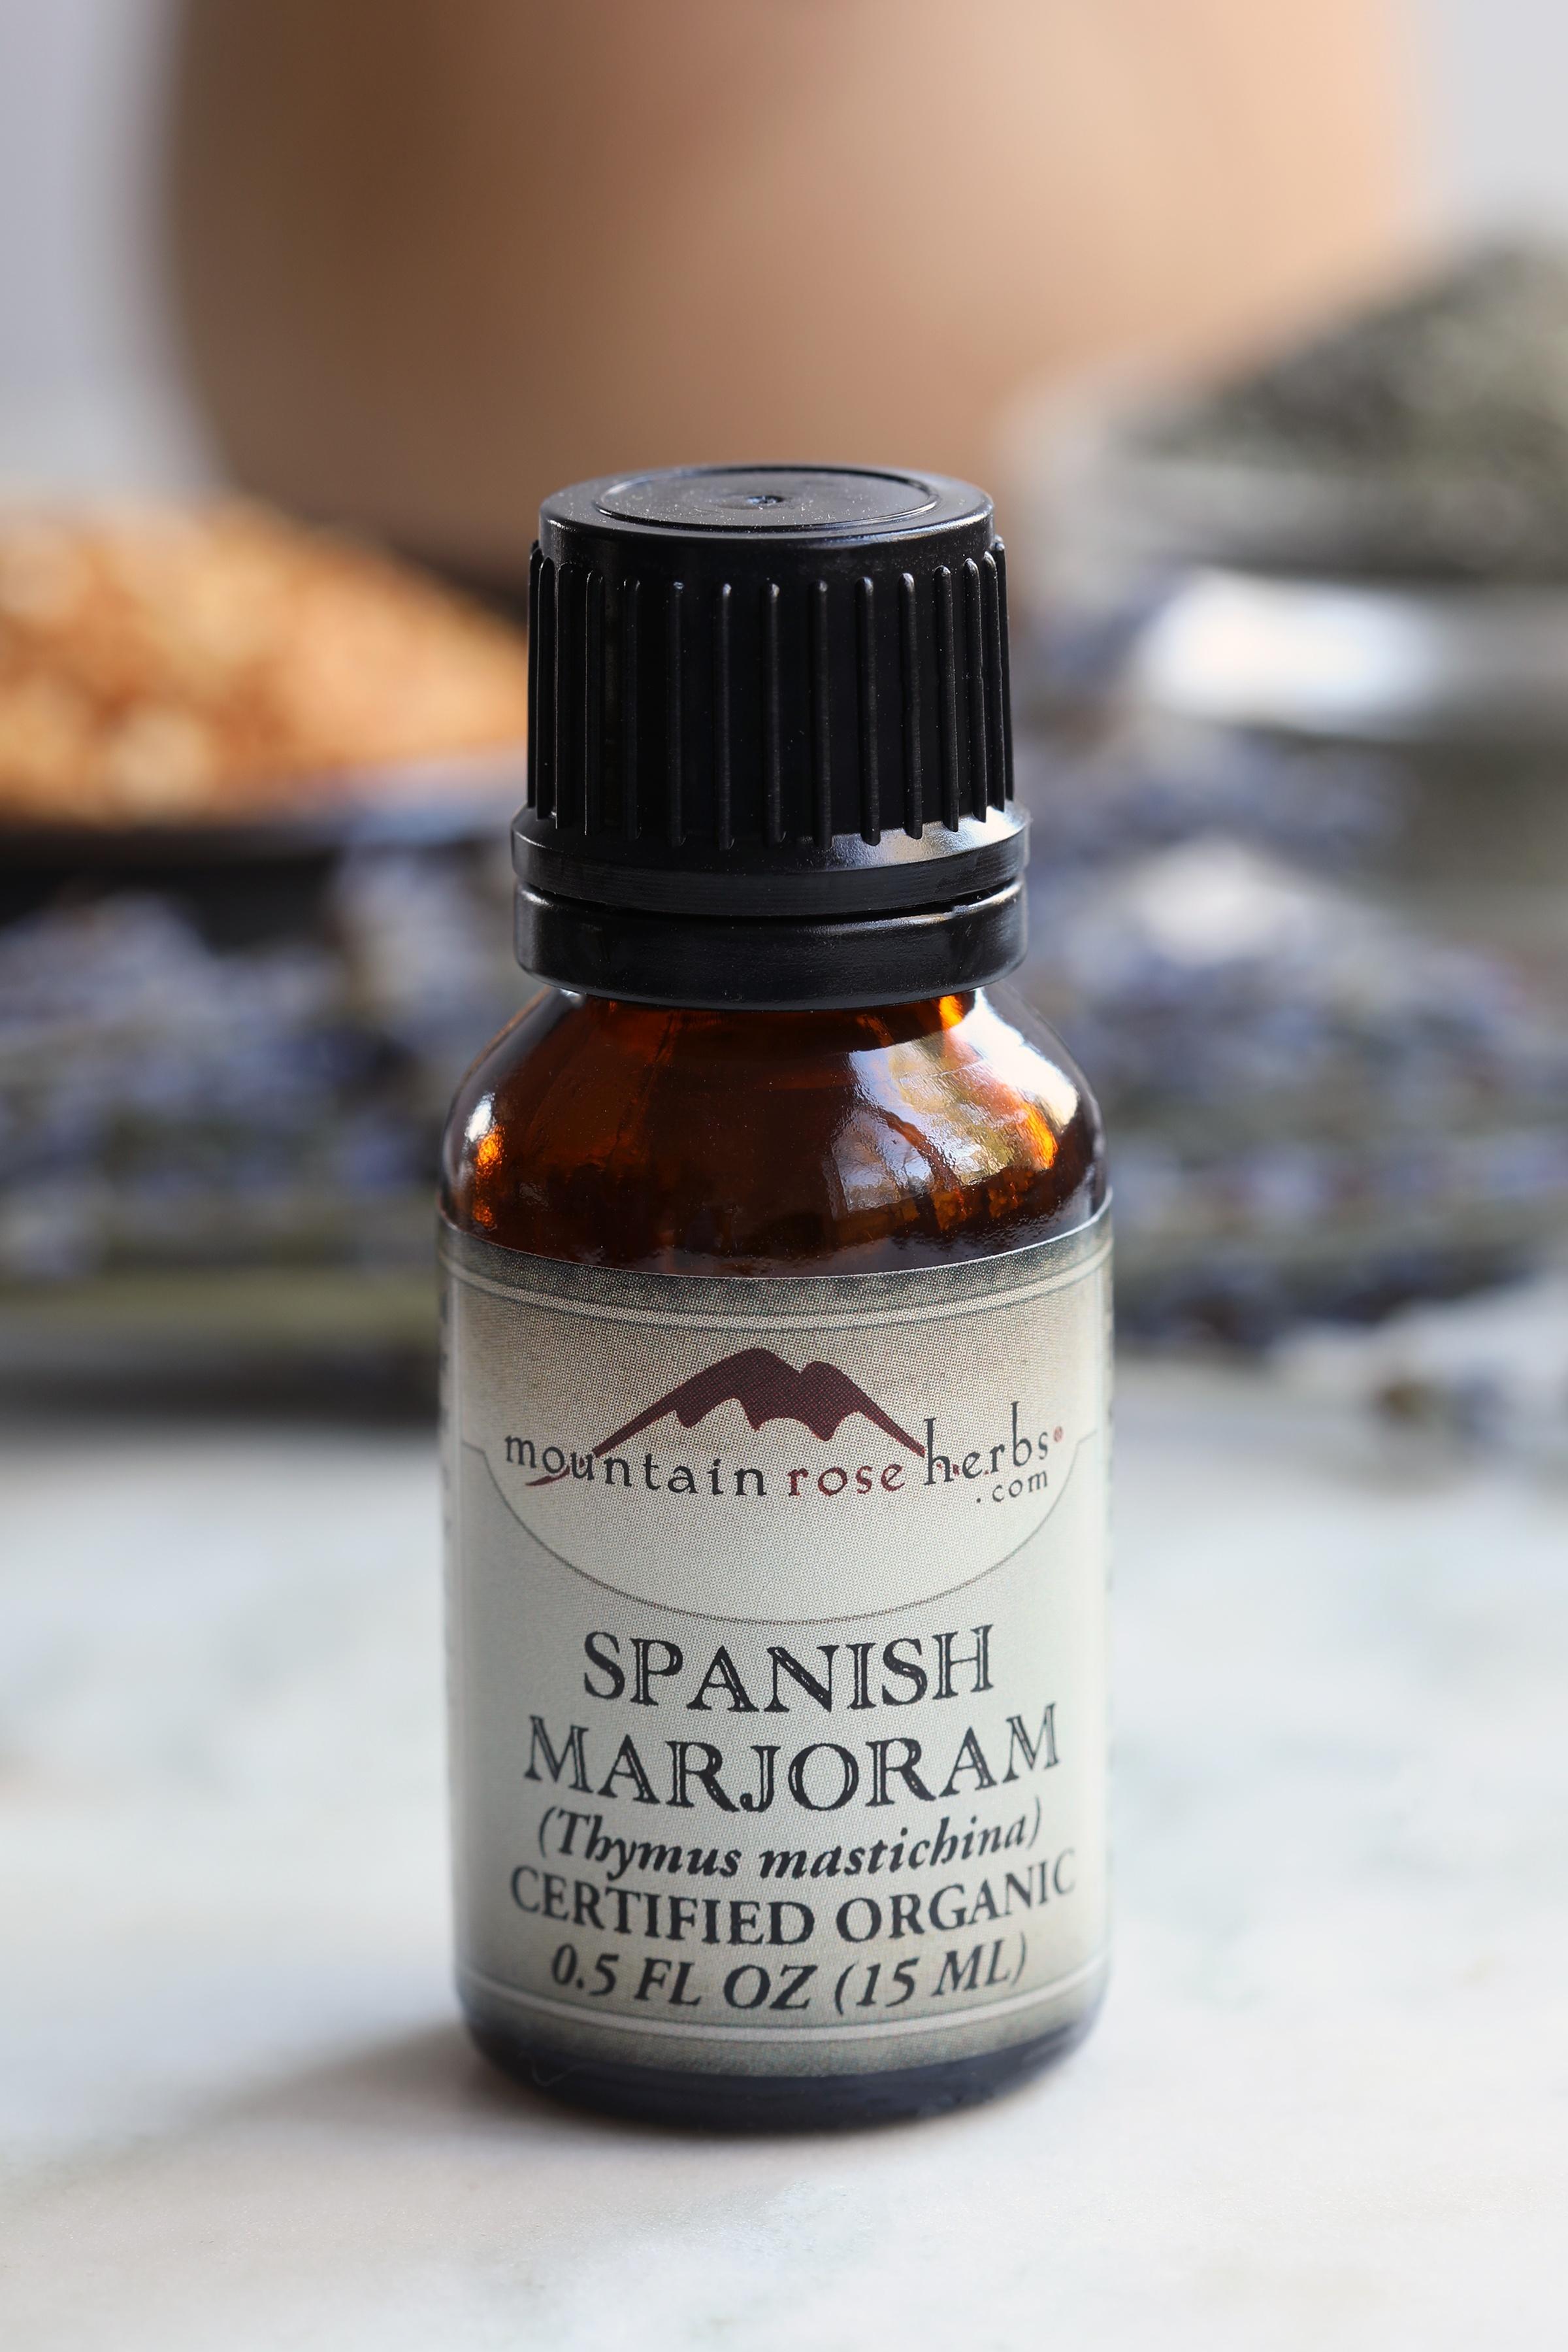 Half ounce bottle of spanish marjoram essential oil sitting on counter